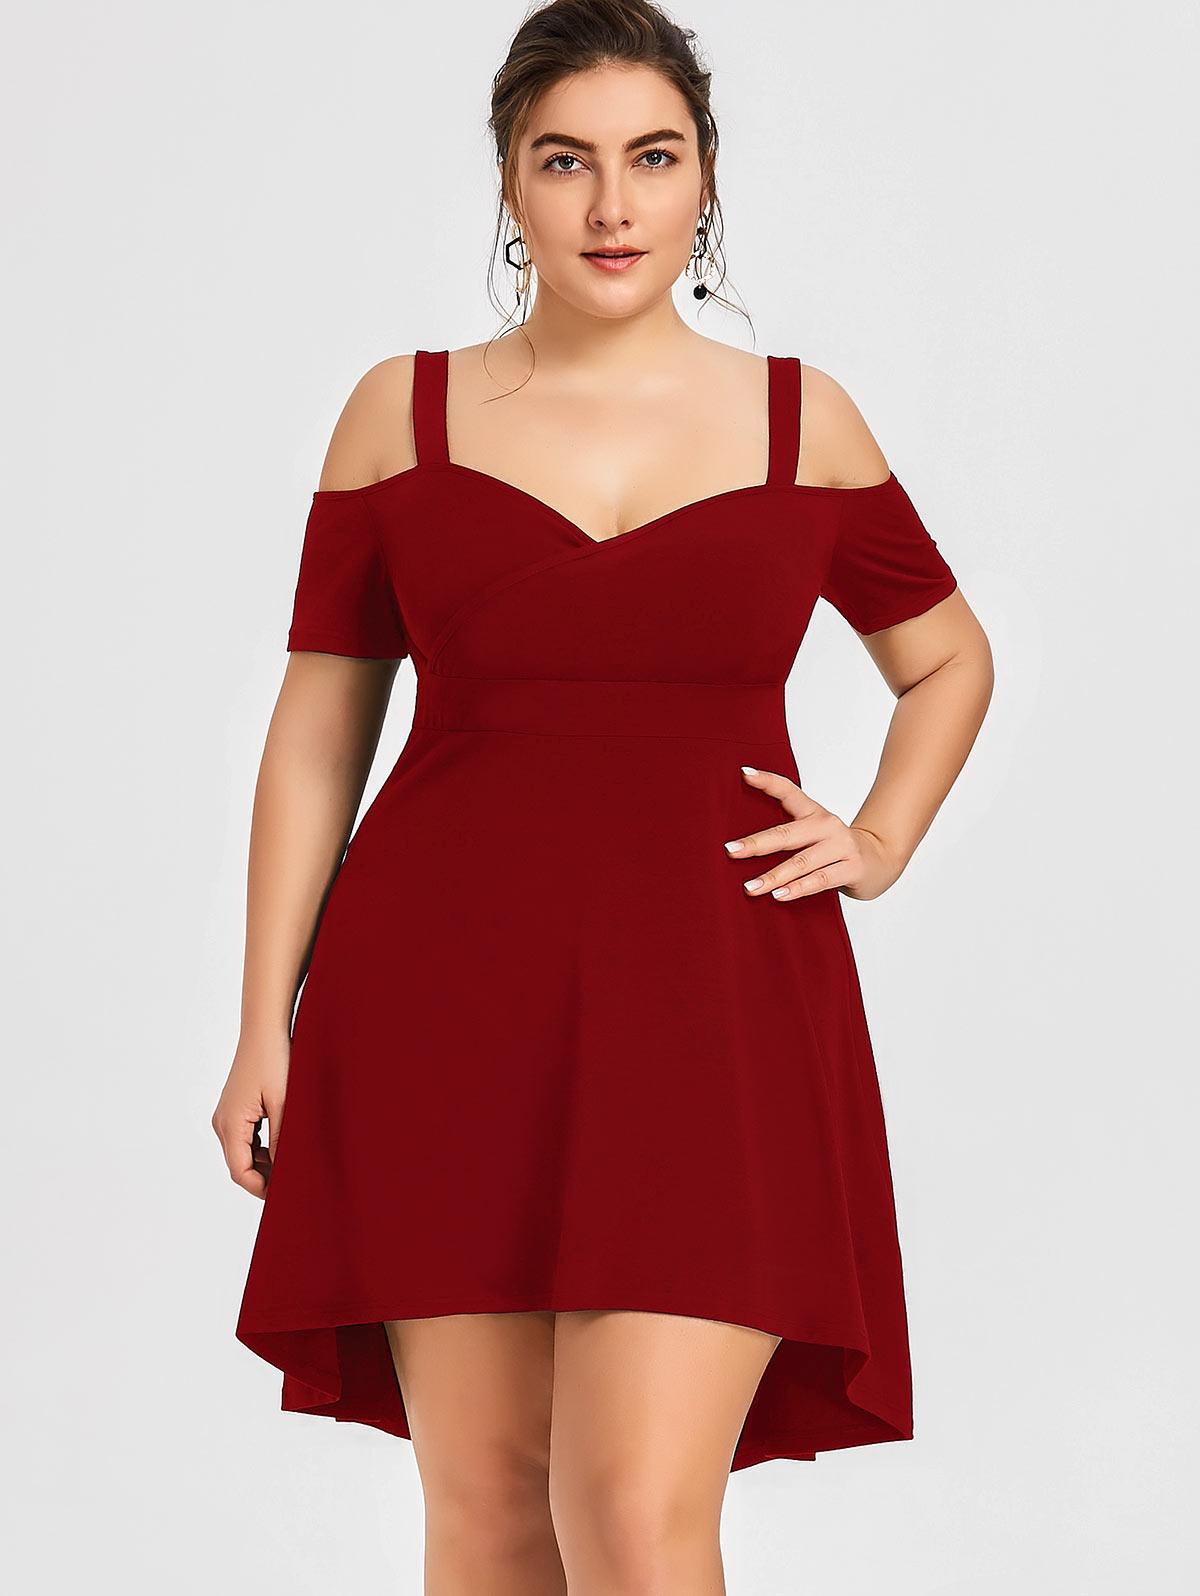 Wipalo Summer Cold Shoulder Black Party Dress Plus Size 5XL ...